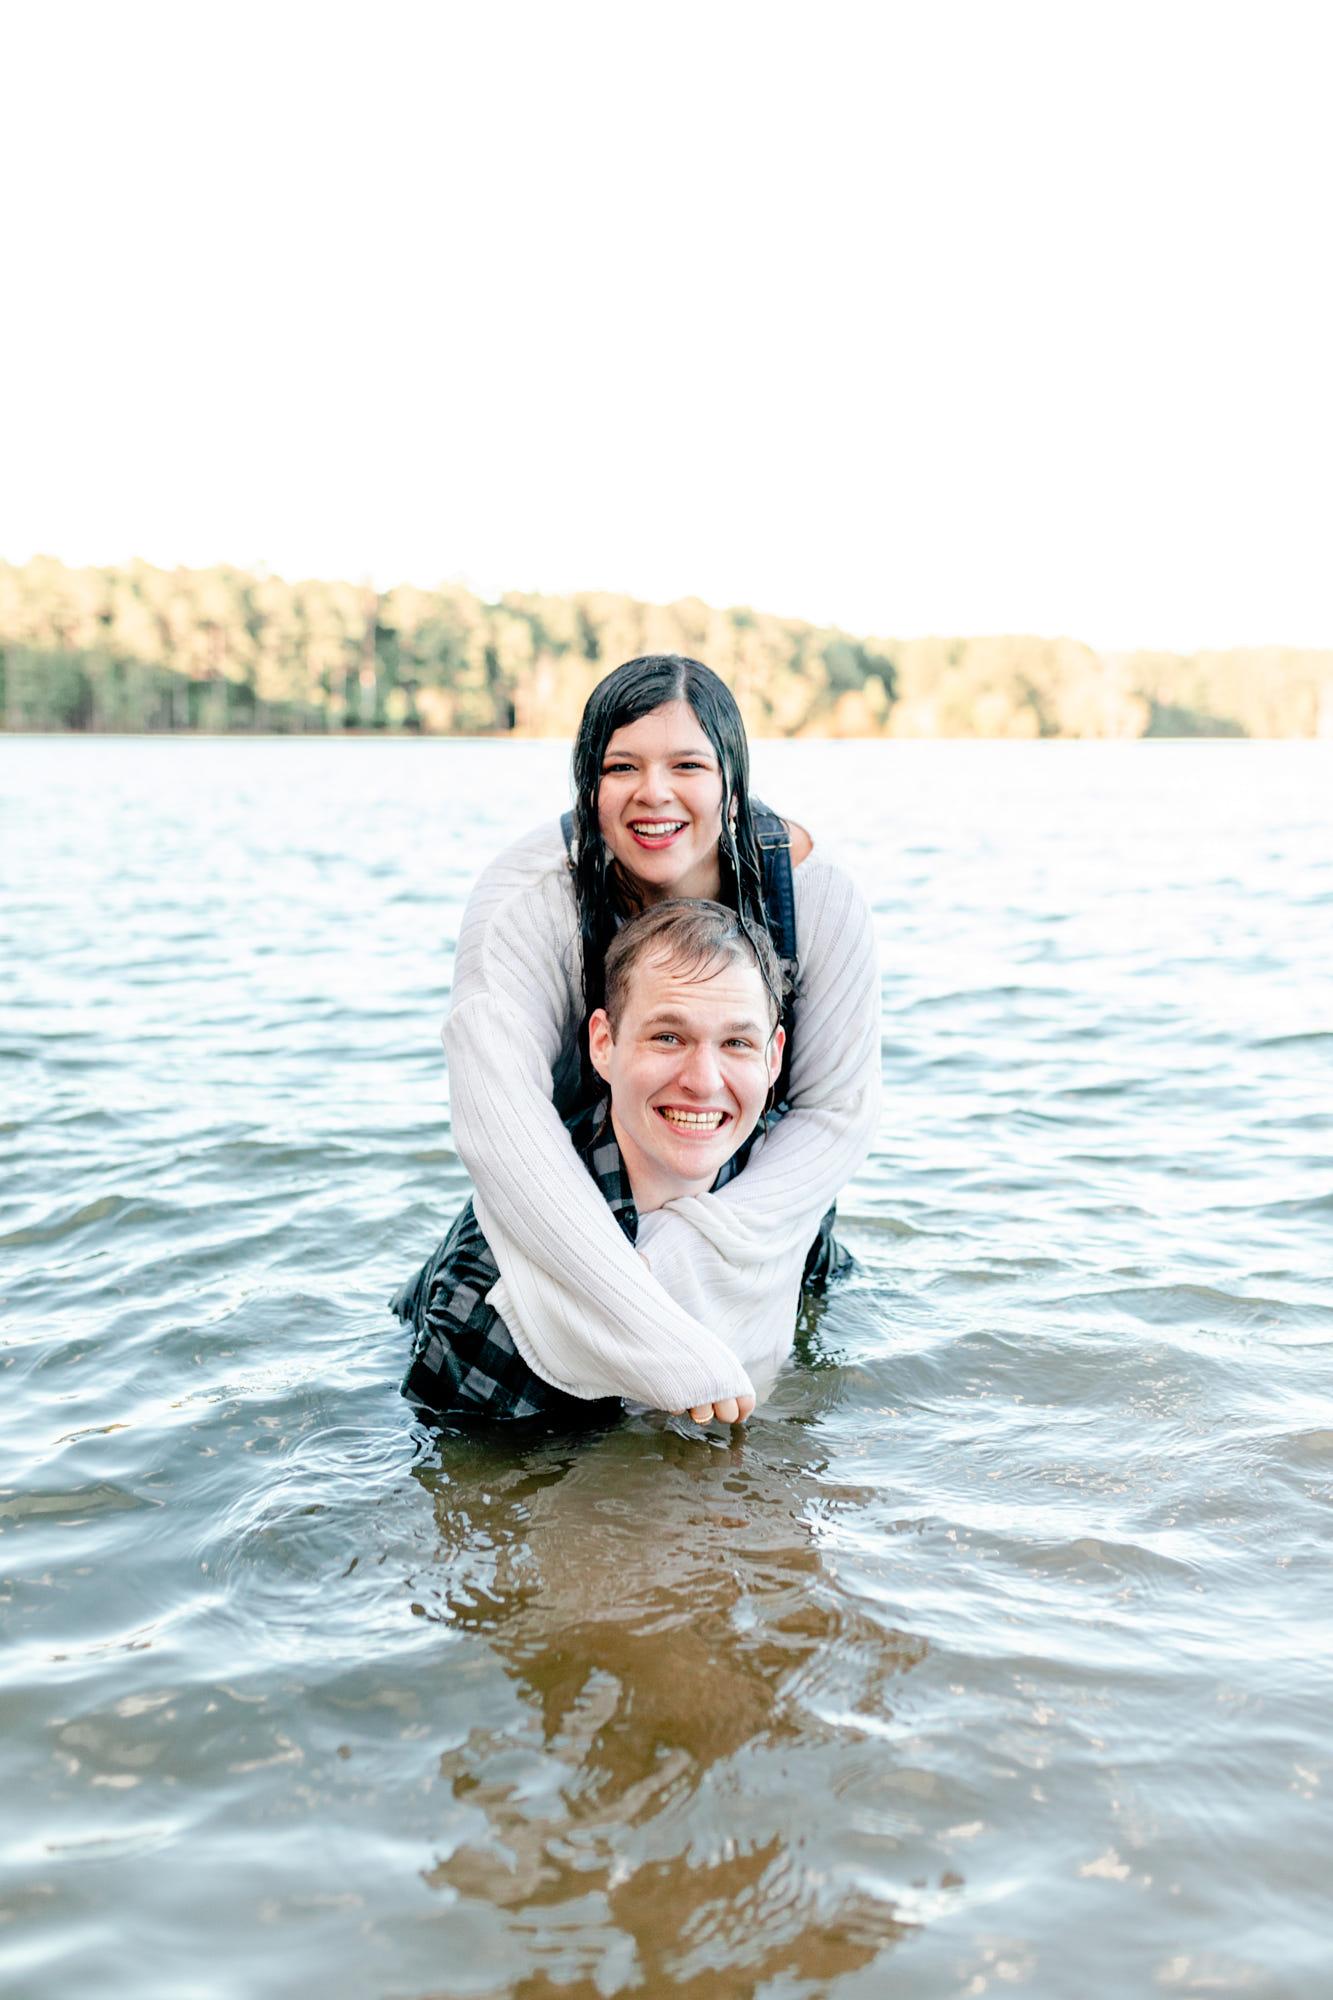 Jordan Lake Engagement Session